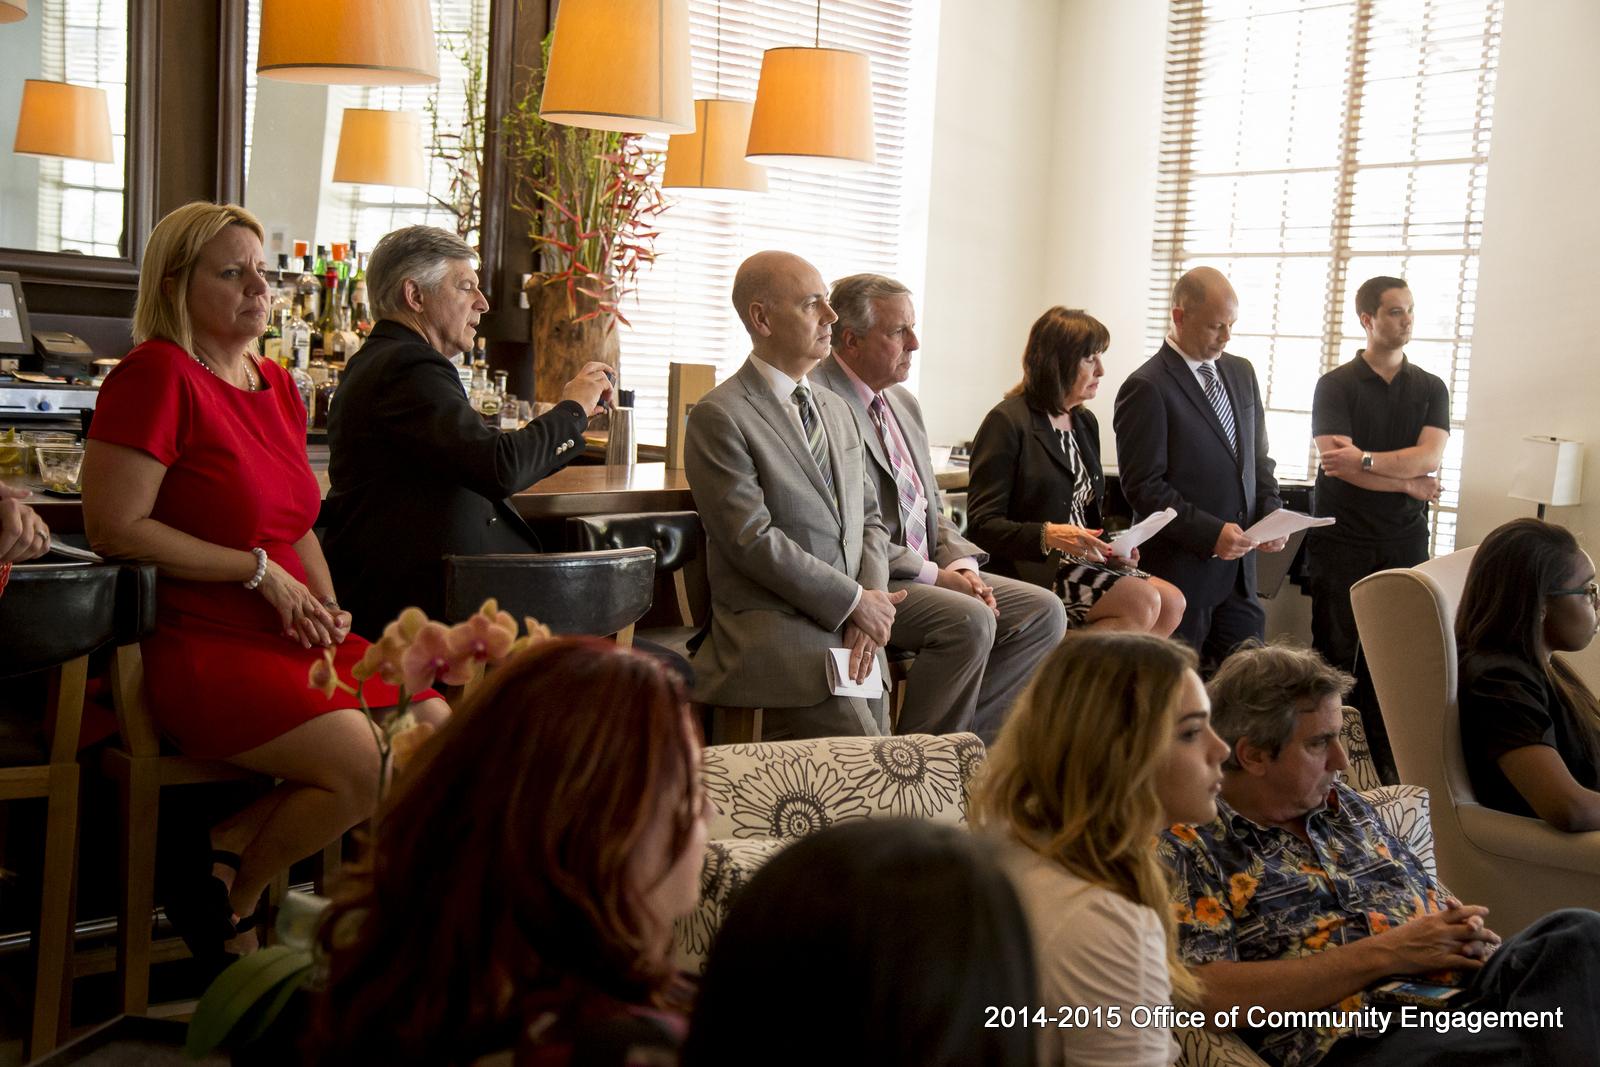 Elie Wiesel AwardsBetsy Hotel05_20_2015Jimmy Abraham_MDCPS_18.jpg